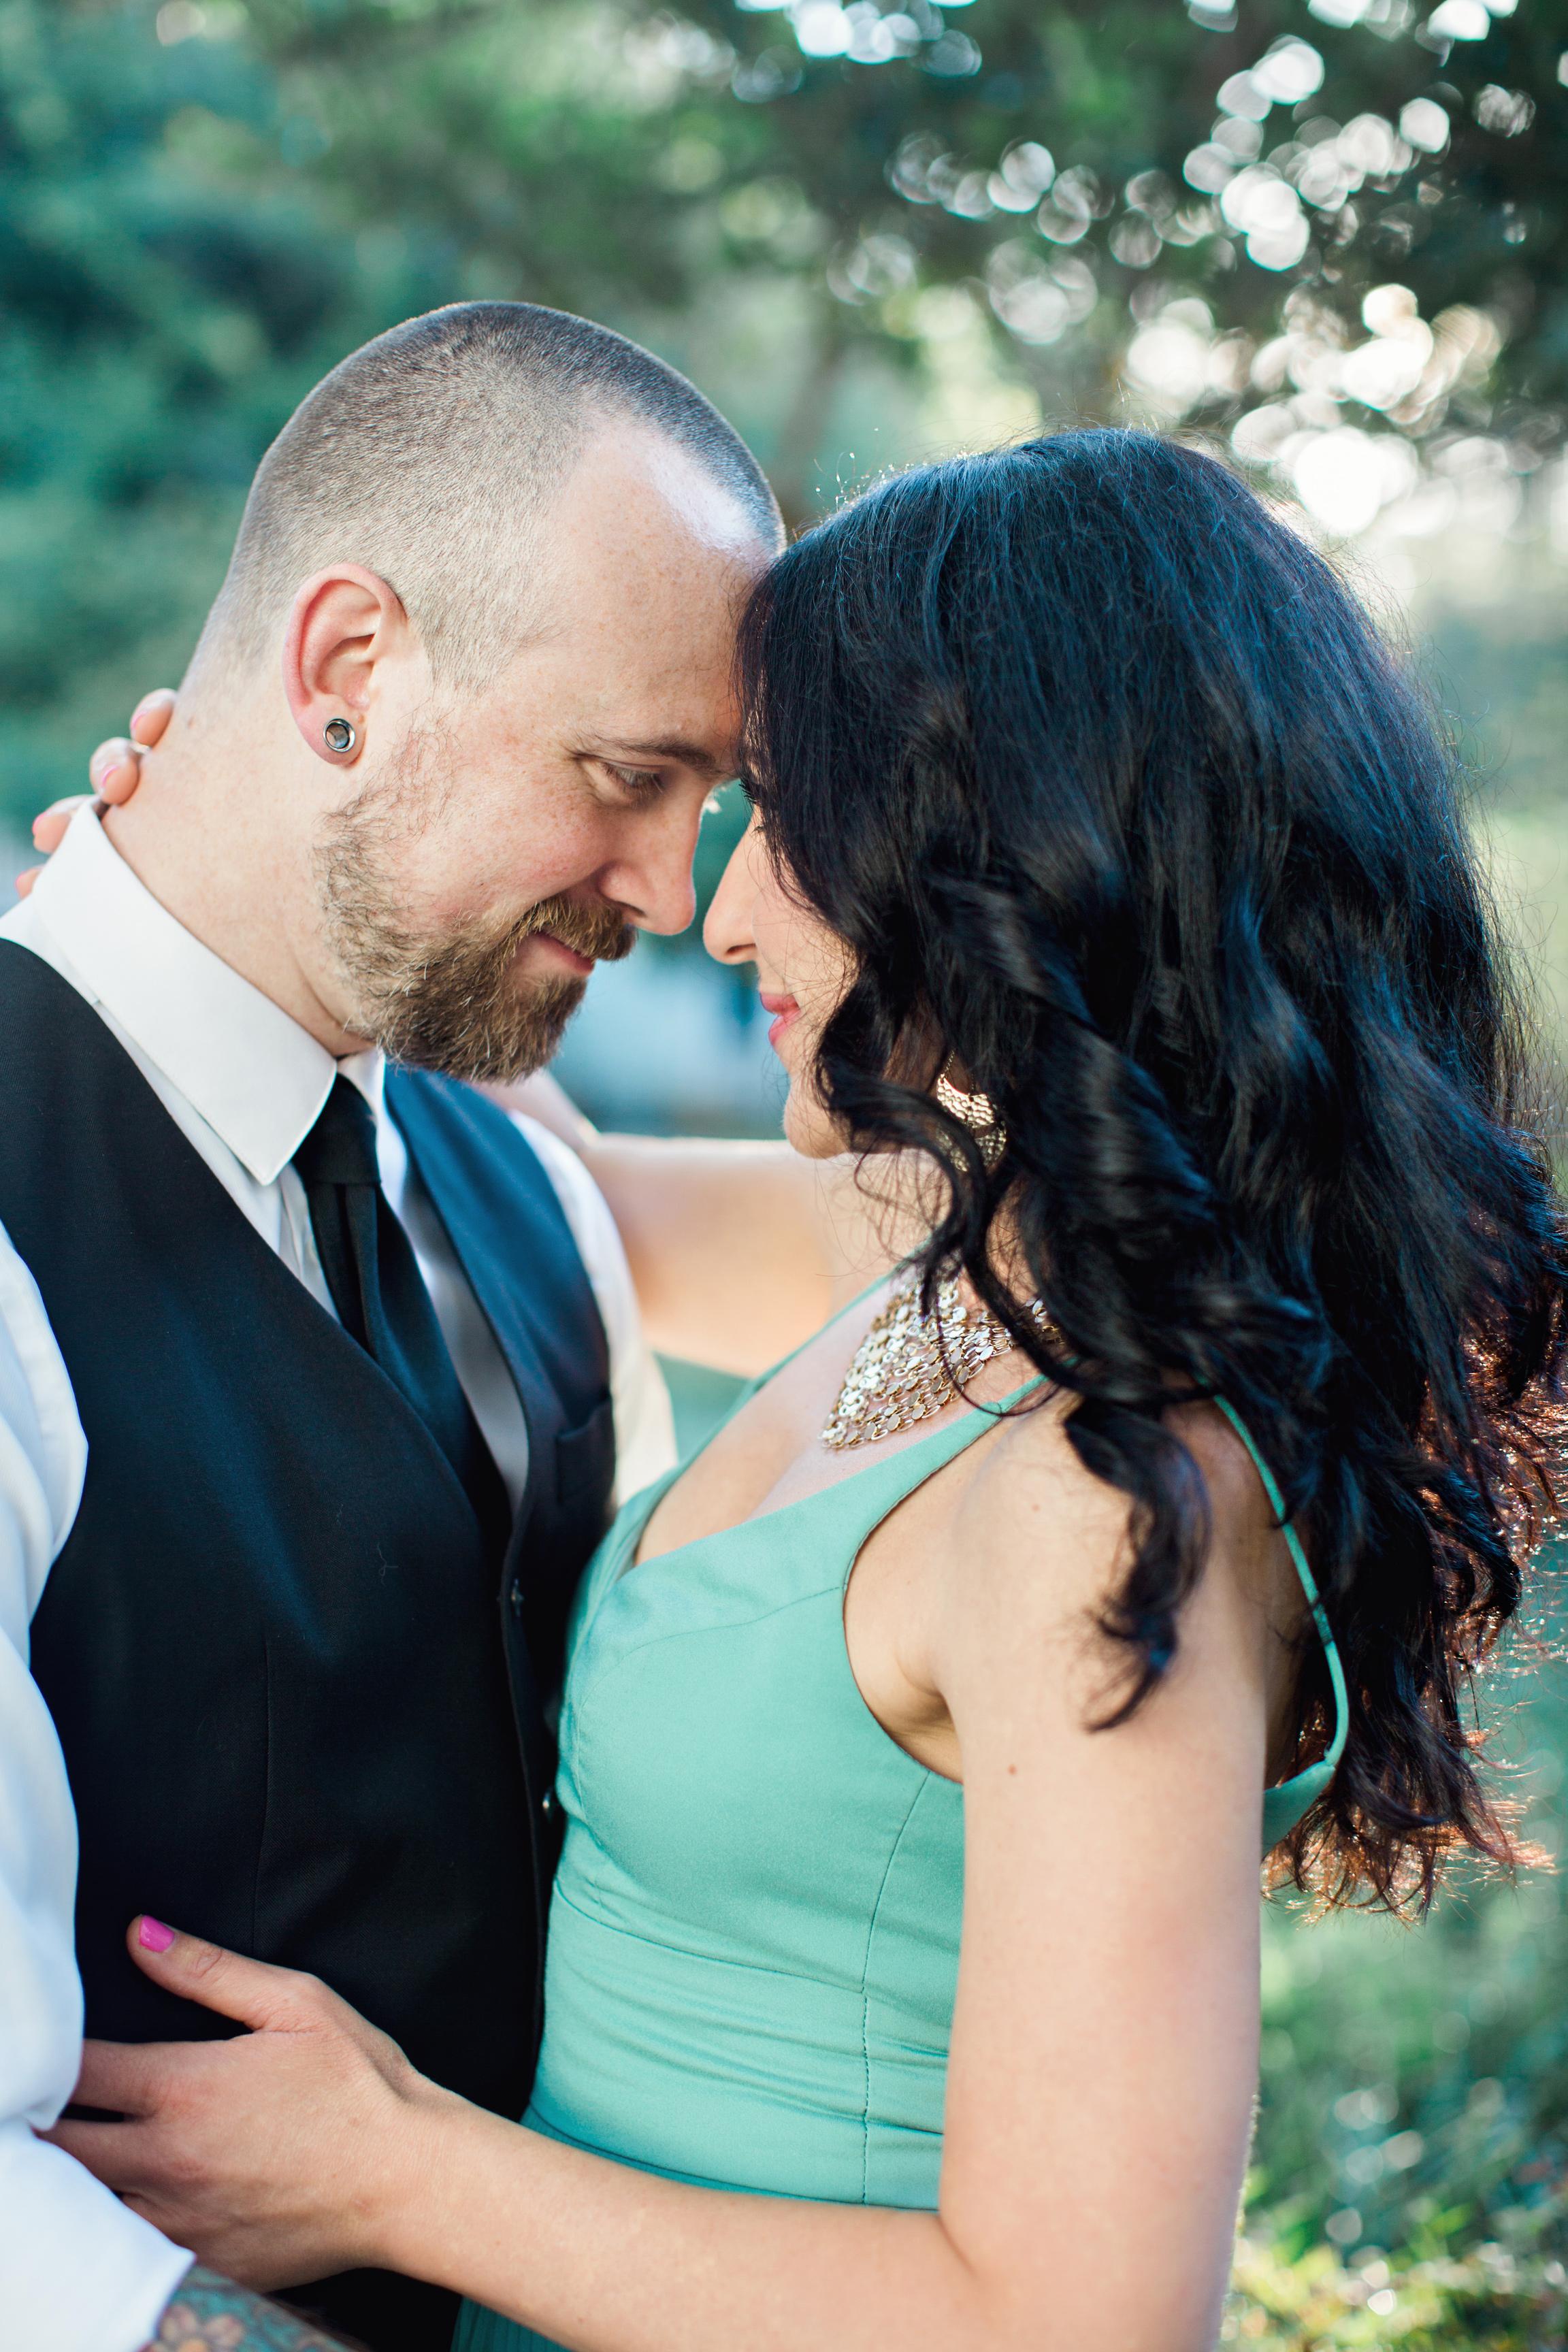 CindyGiovagnoliPhotography_Seattle_Washington_PNW_Couple_Engagement_Portrait_Photography-010.jpg